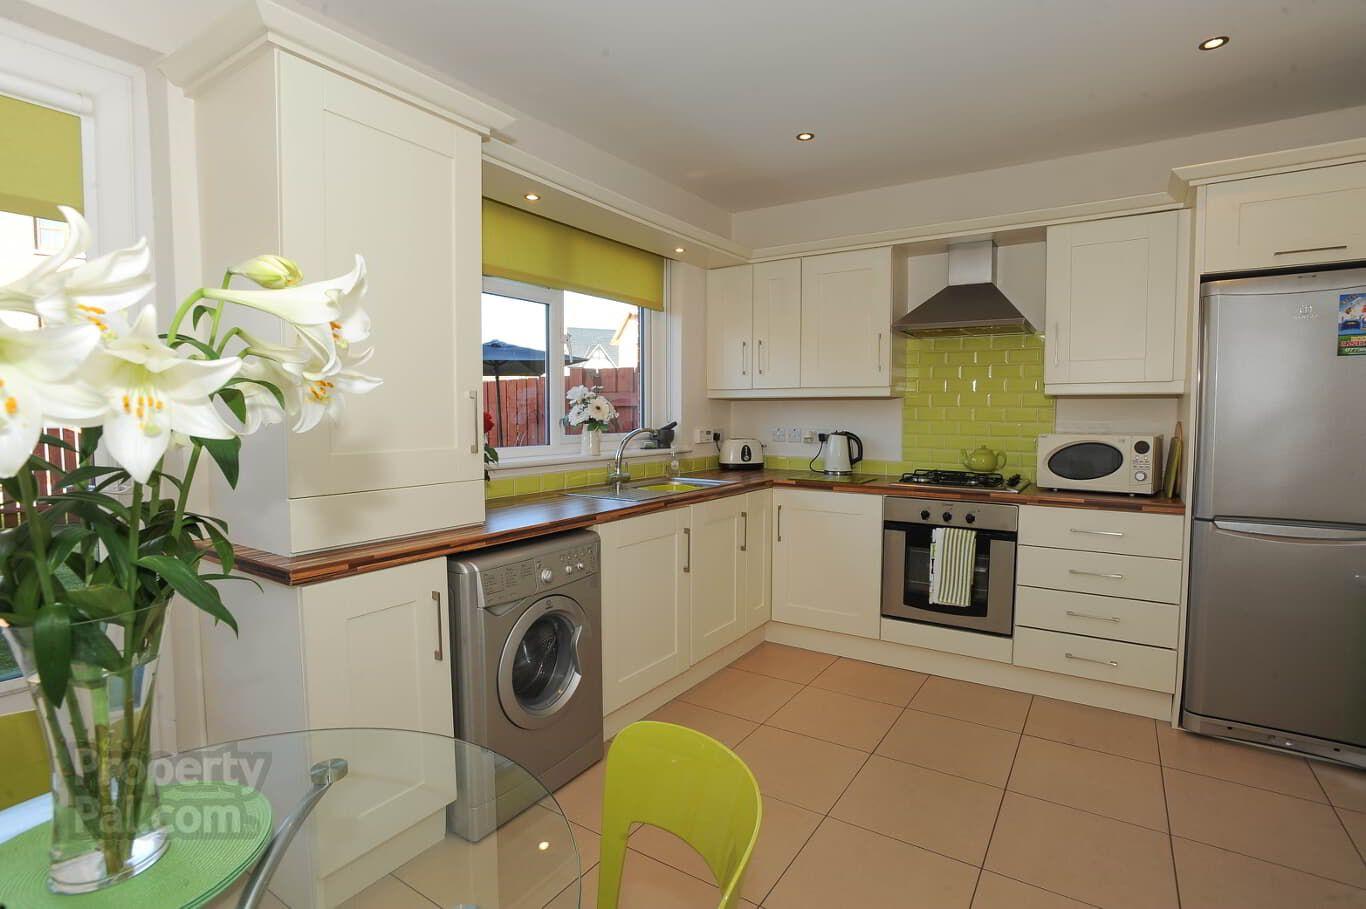 18 Bridgelea Crescent, Conlig, Newtownards #kitchen